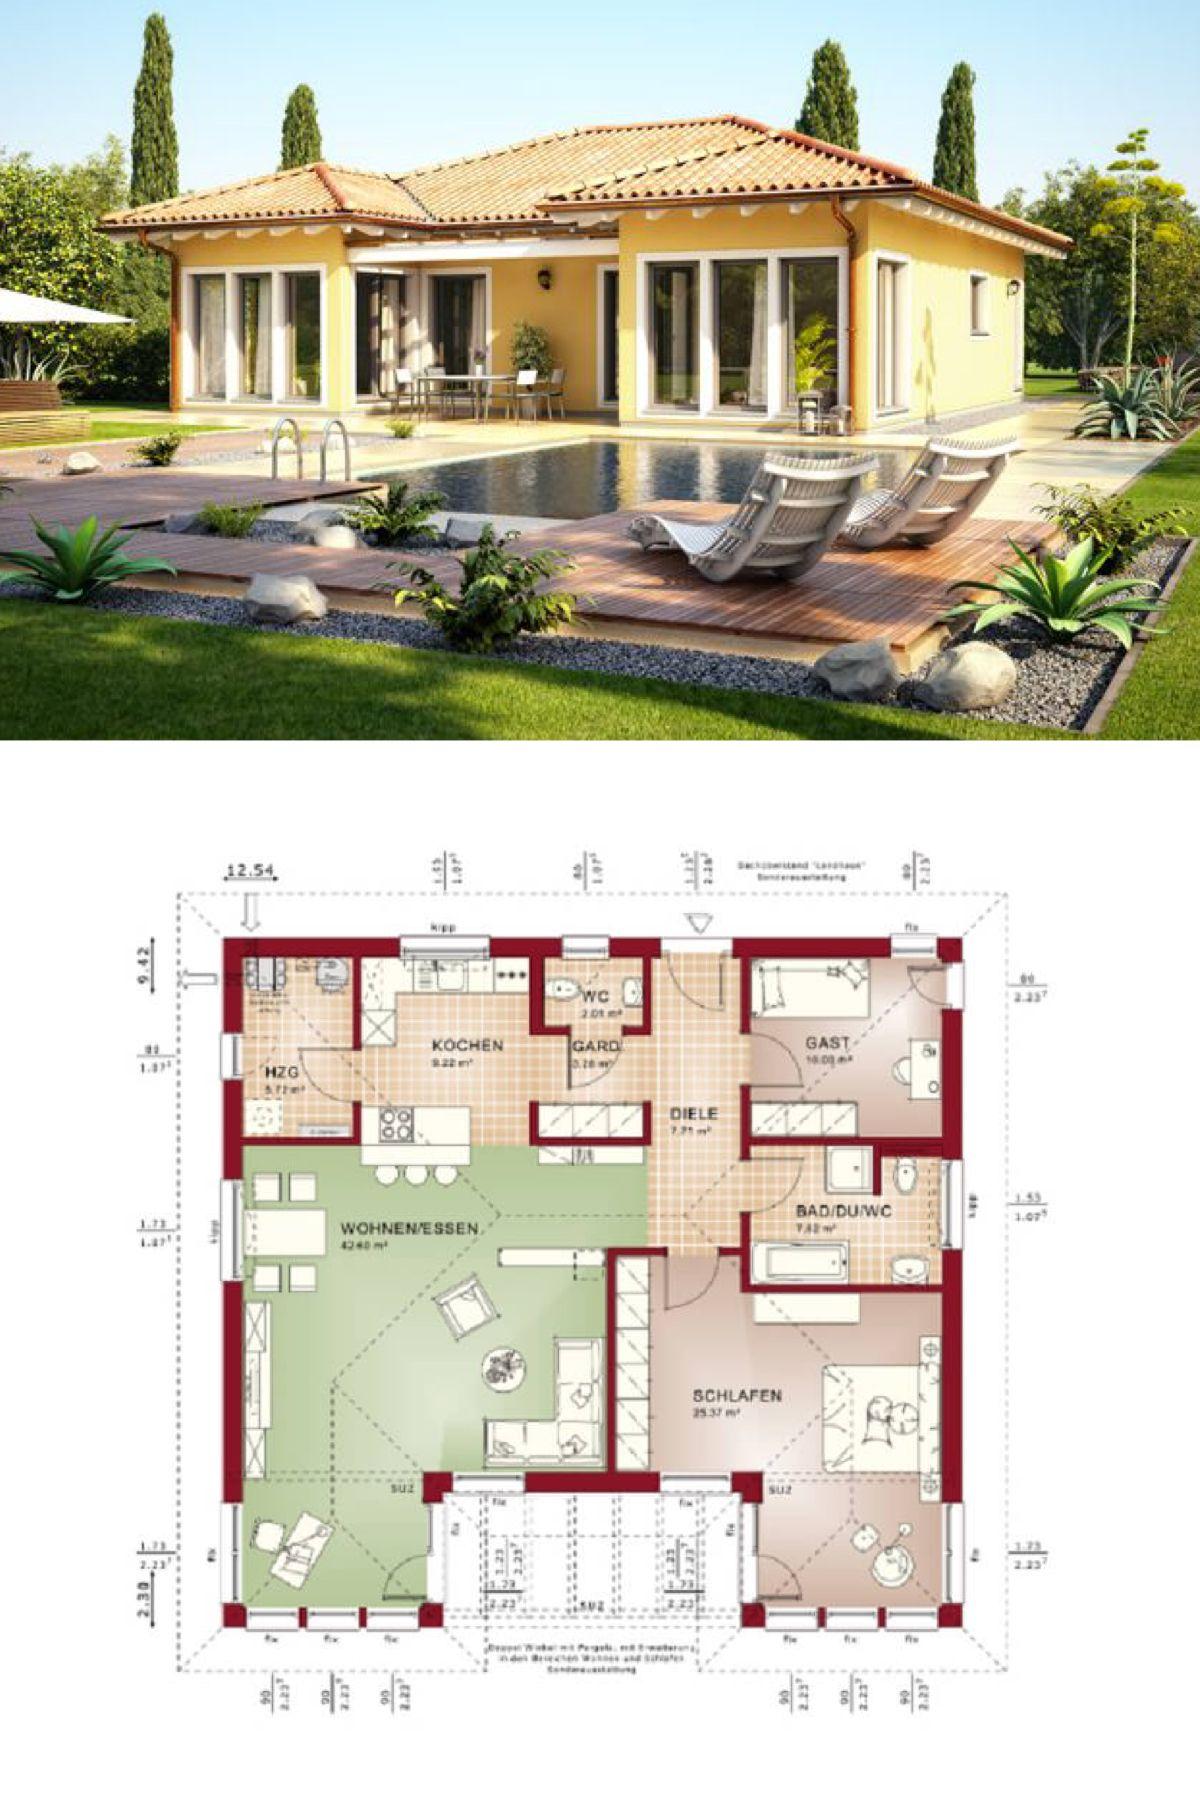 Bungalow haus evolution  bien zenker fertighaus mediterran walmdach grundriss grace njihia bedroom modern also best images in rh pinterest